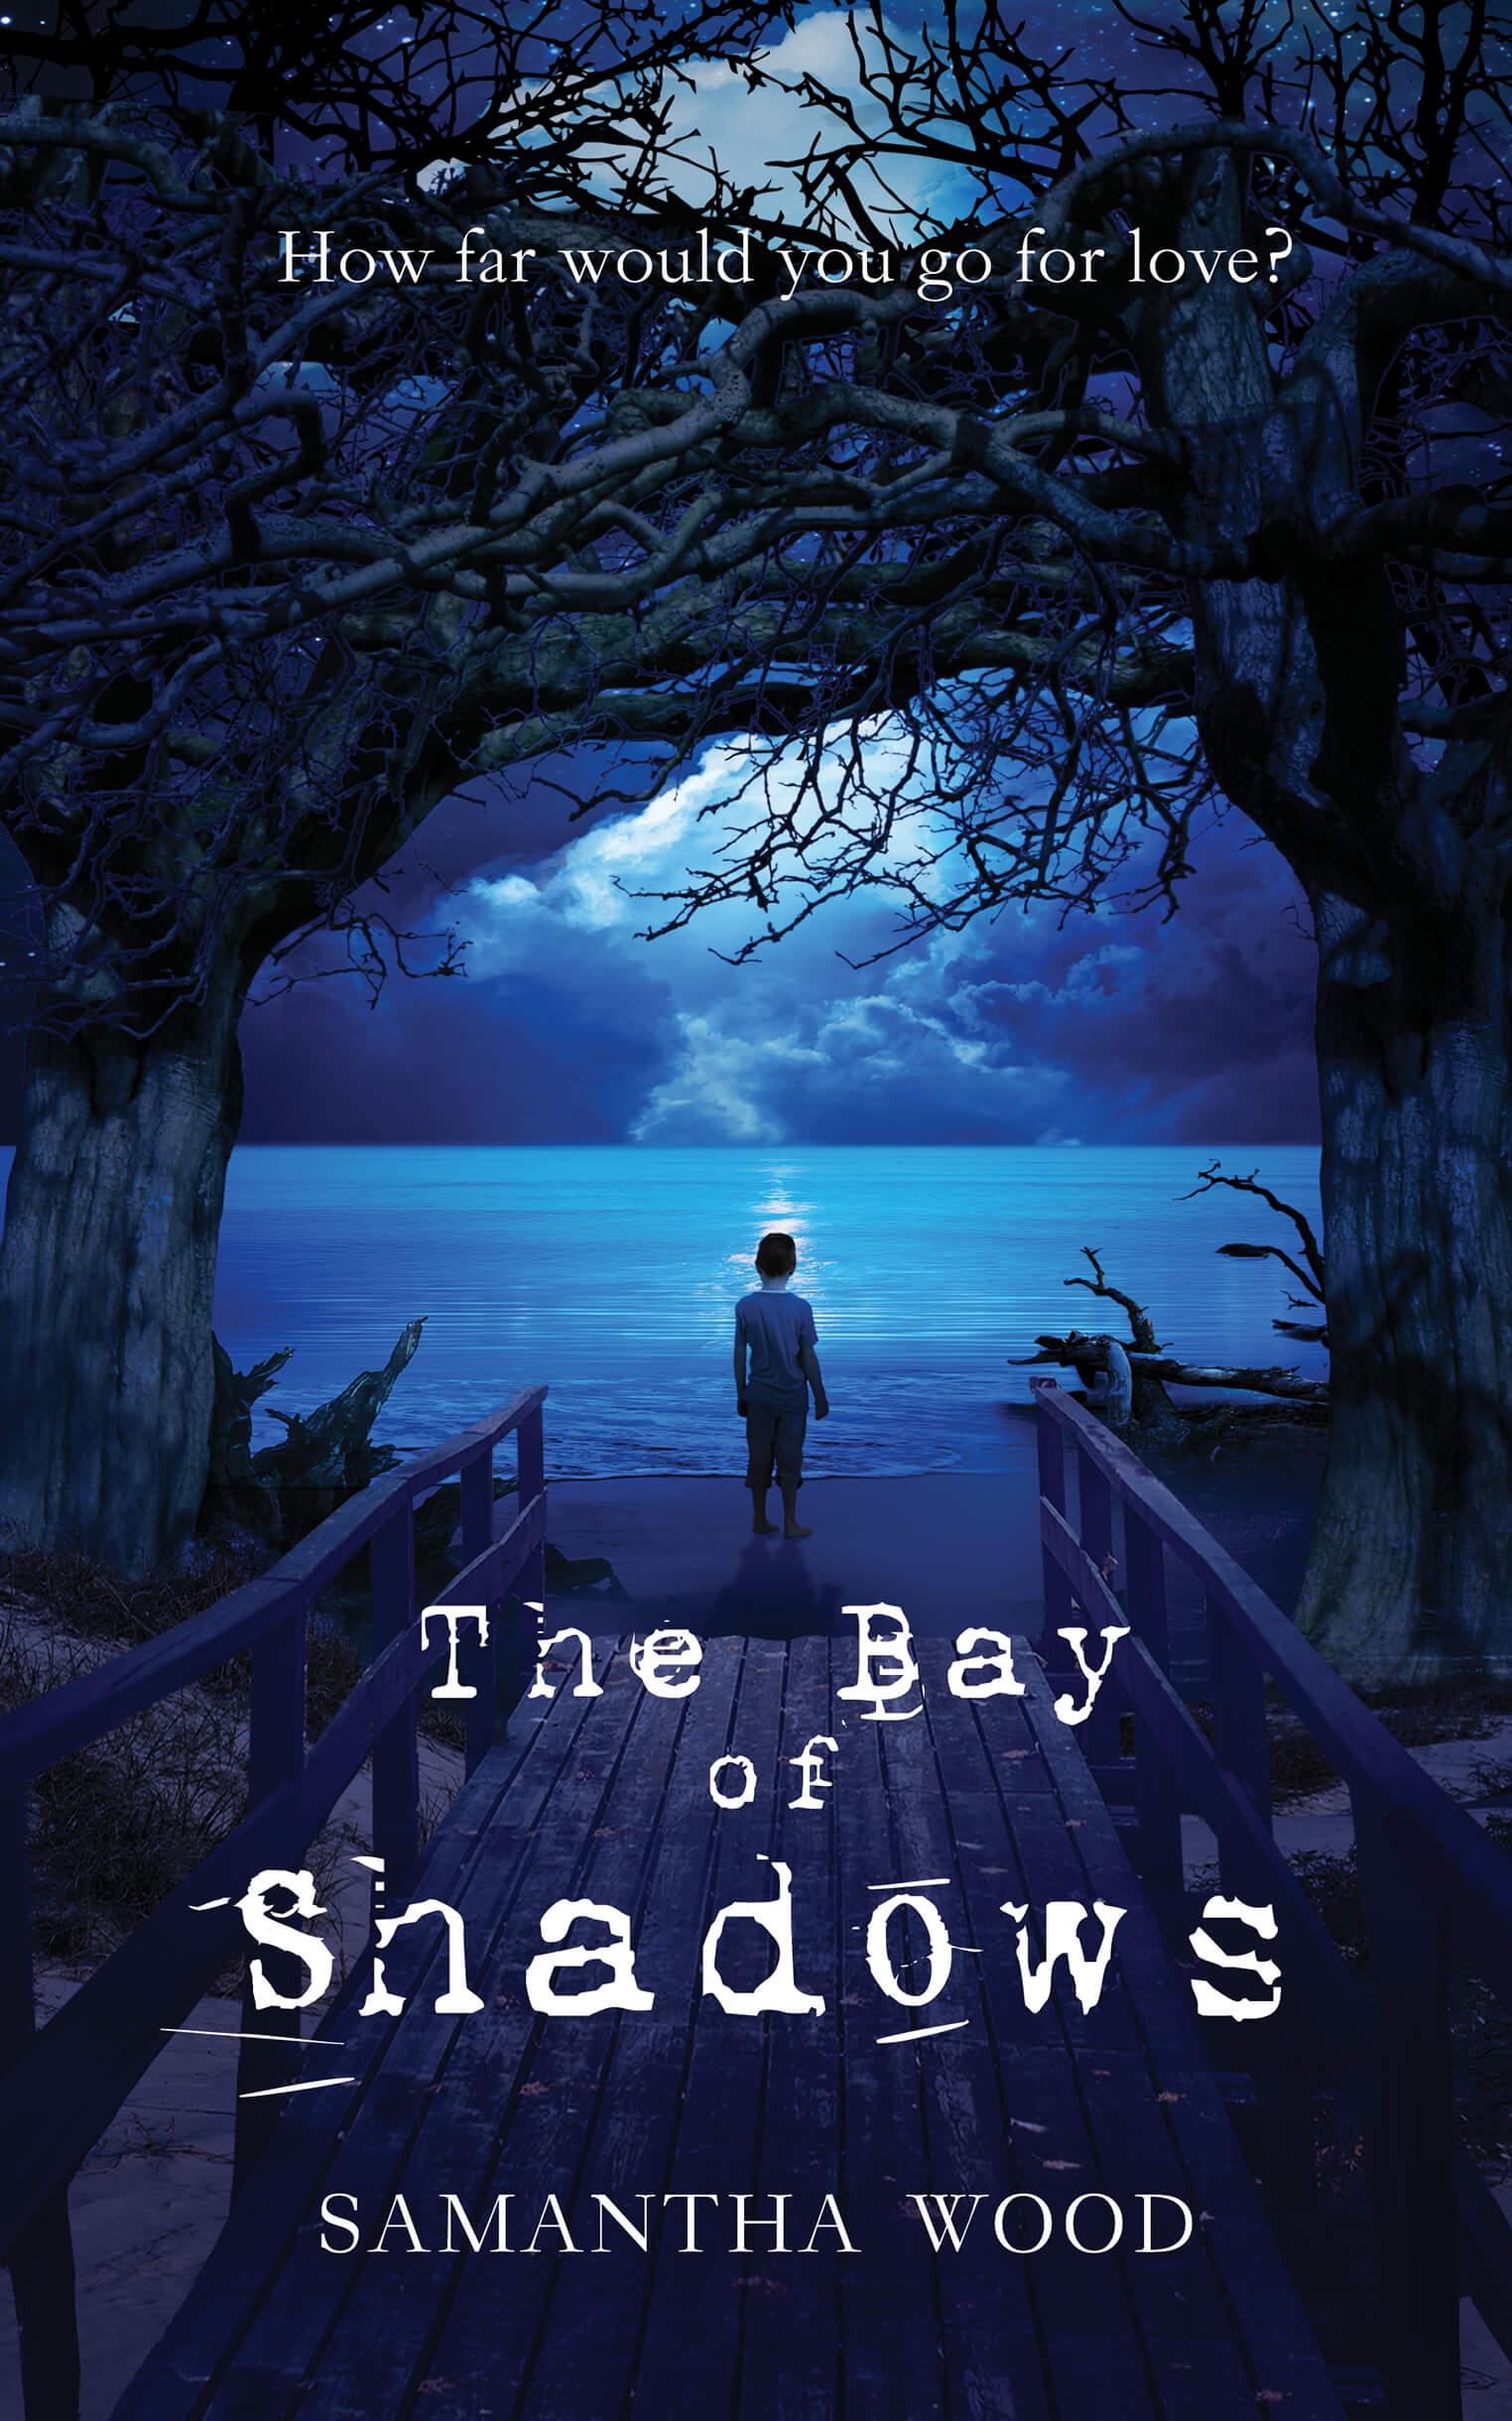 The Bay of Shadows, a novel by Samantha Wood.